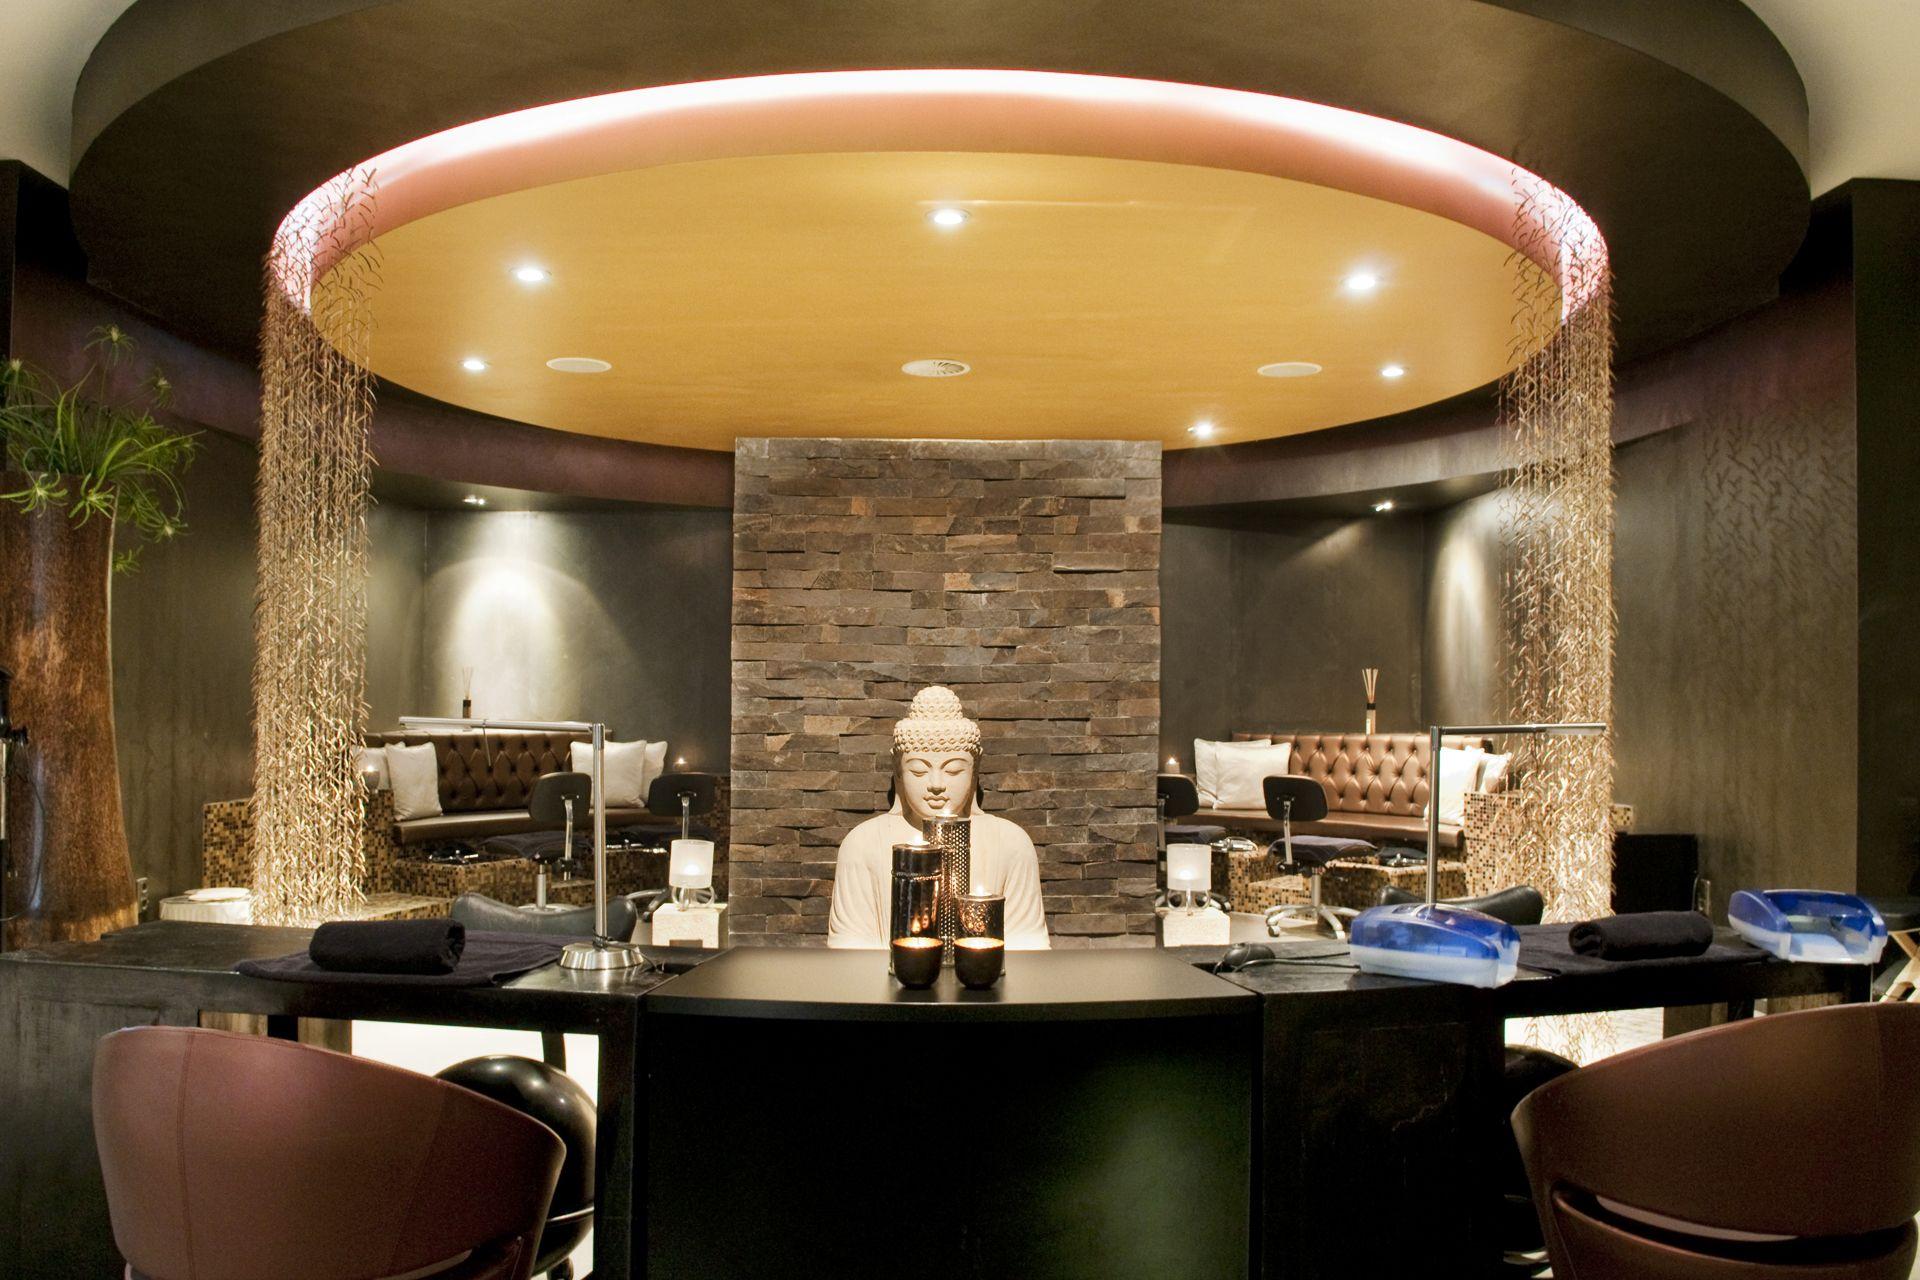 Engels Creations lifestyle salon @ Treatwell.com